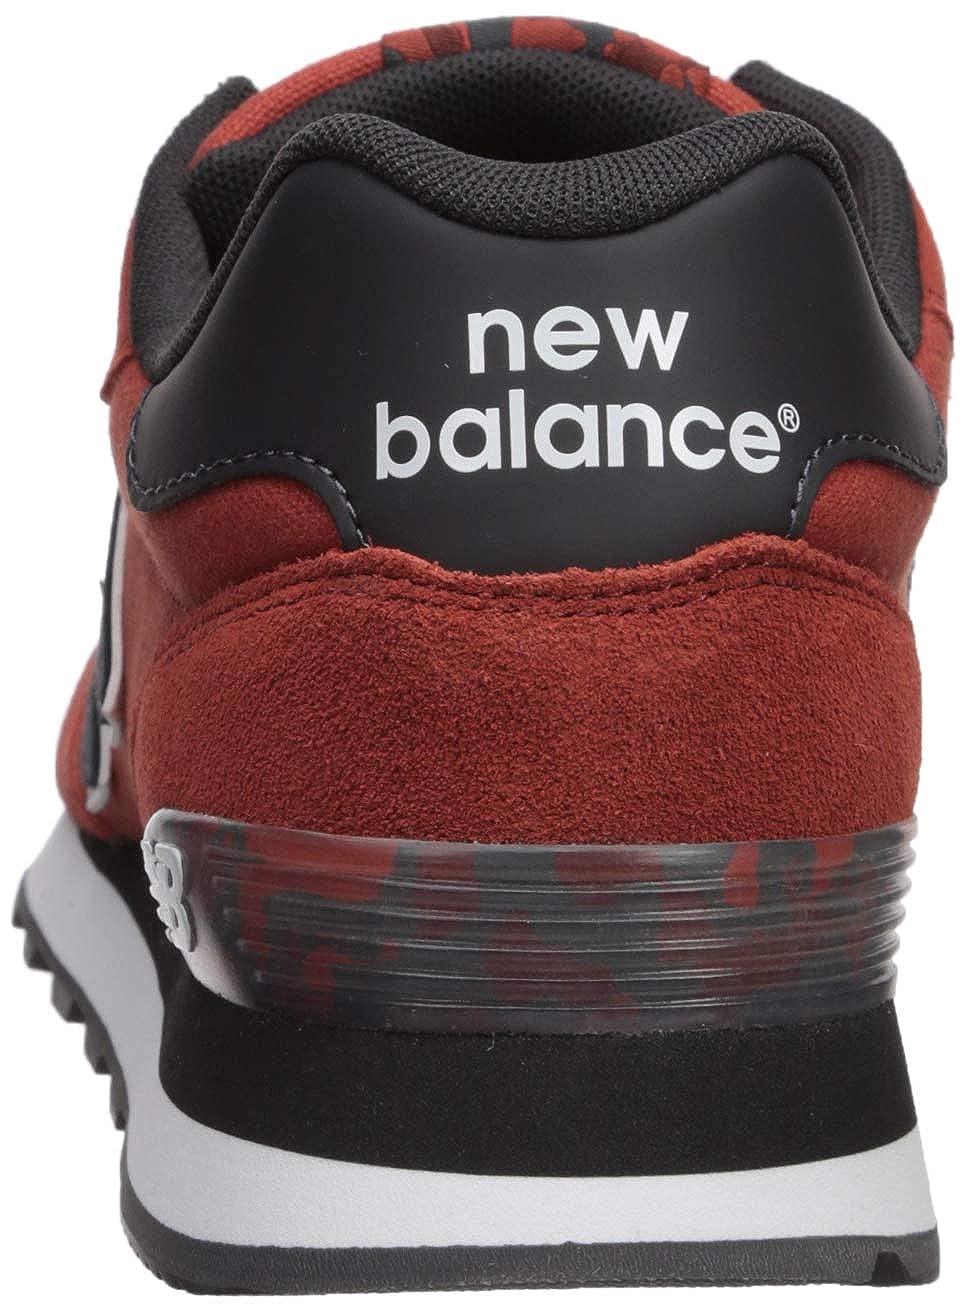 New Balance Herren 515v1 515v1 515v1 Turnschuh burgunderfarben B07BL17Z3Q  cf630f